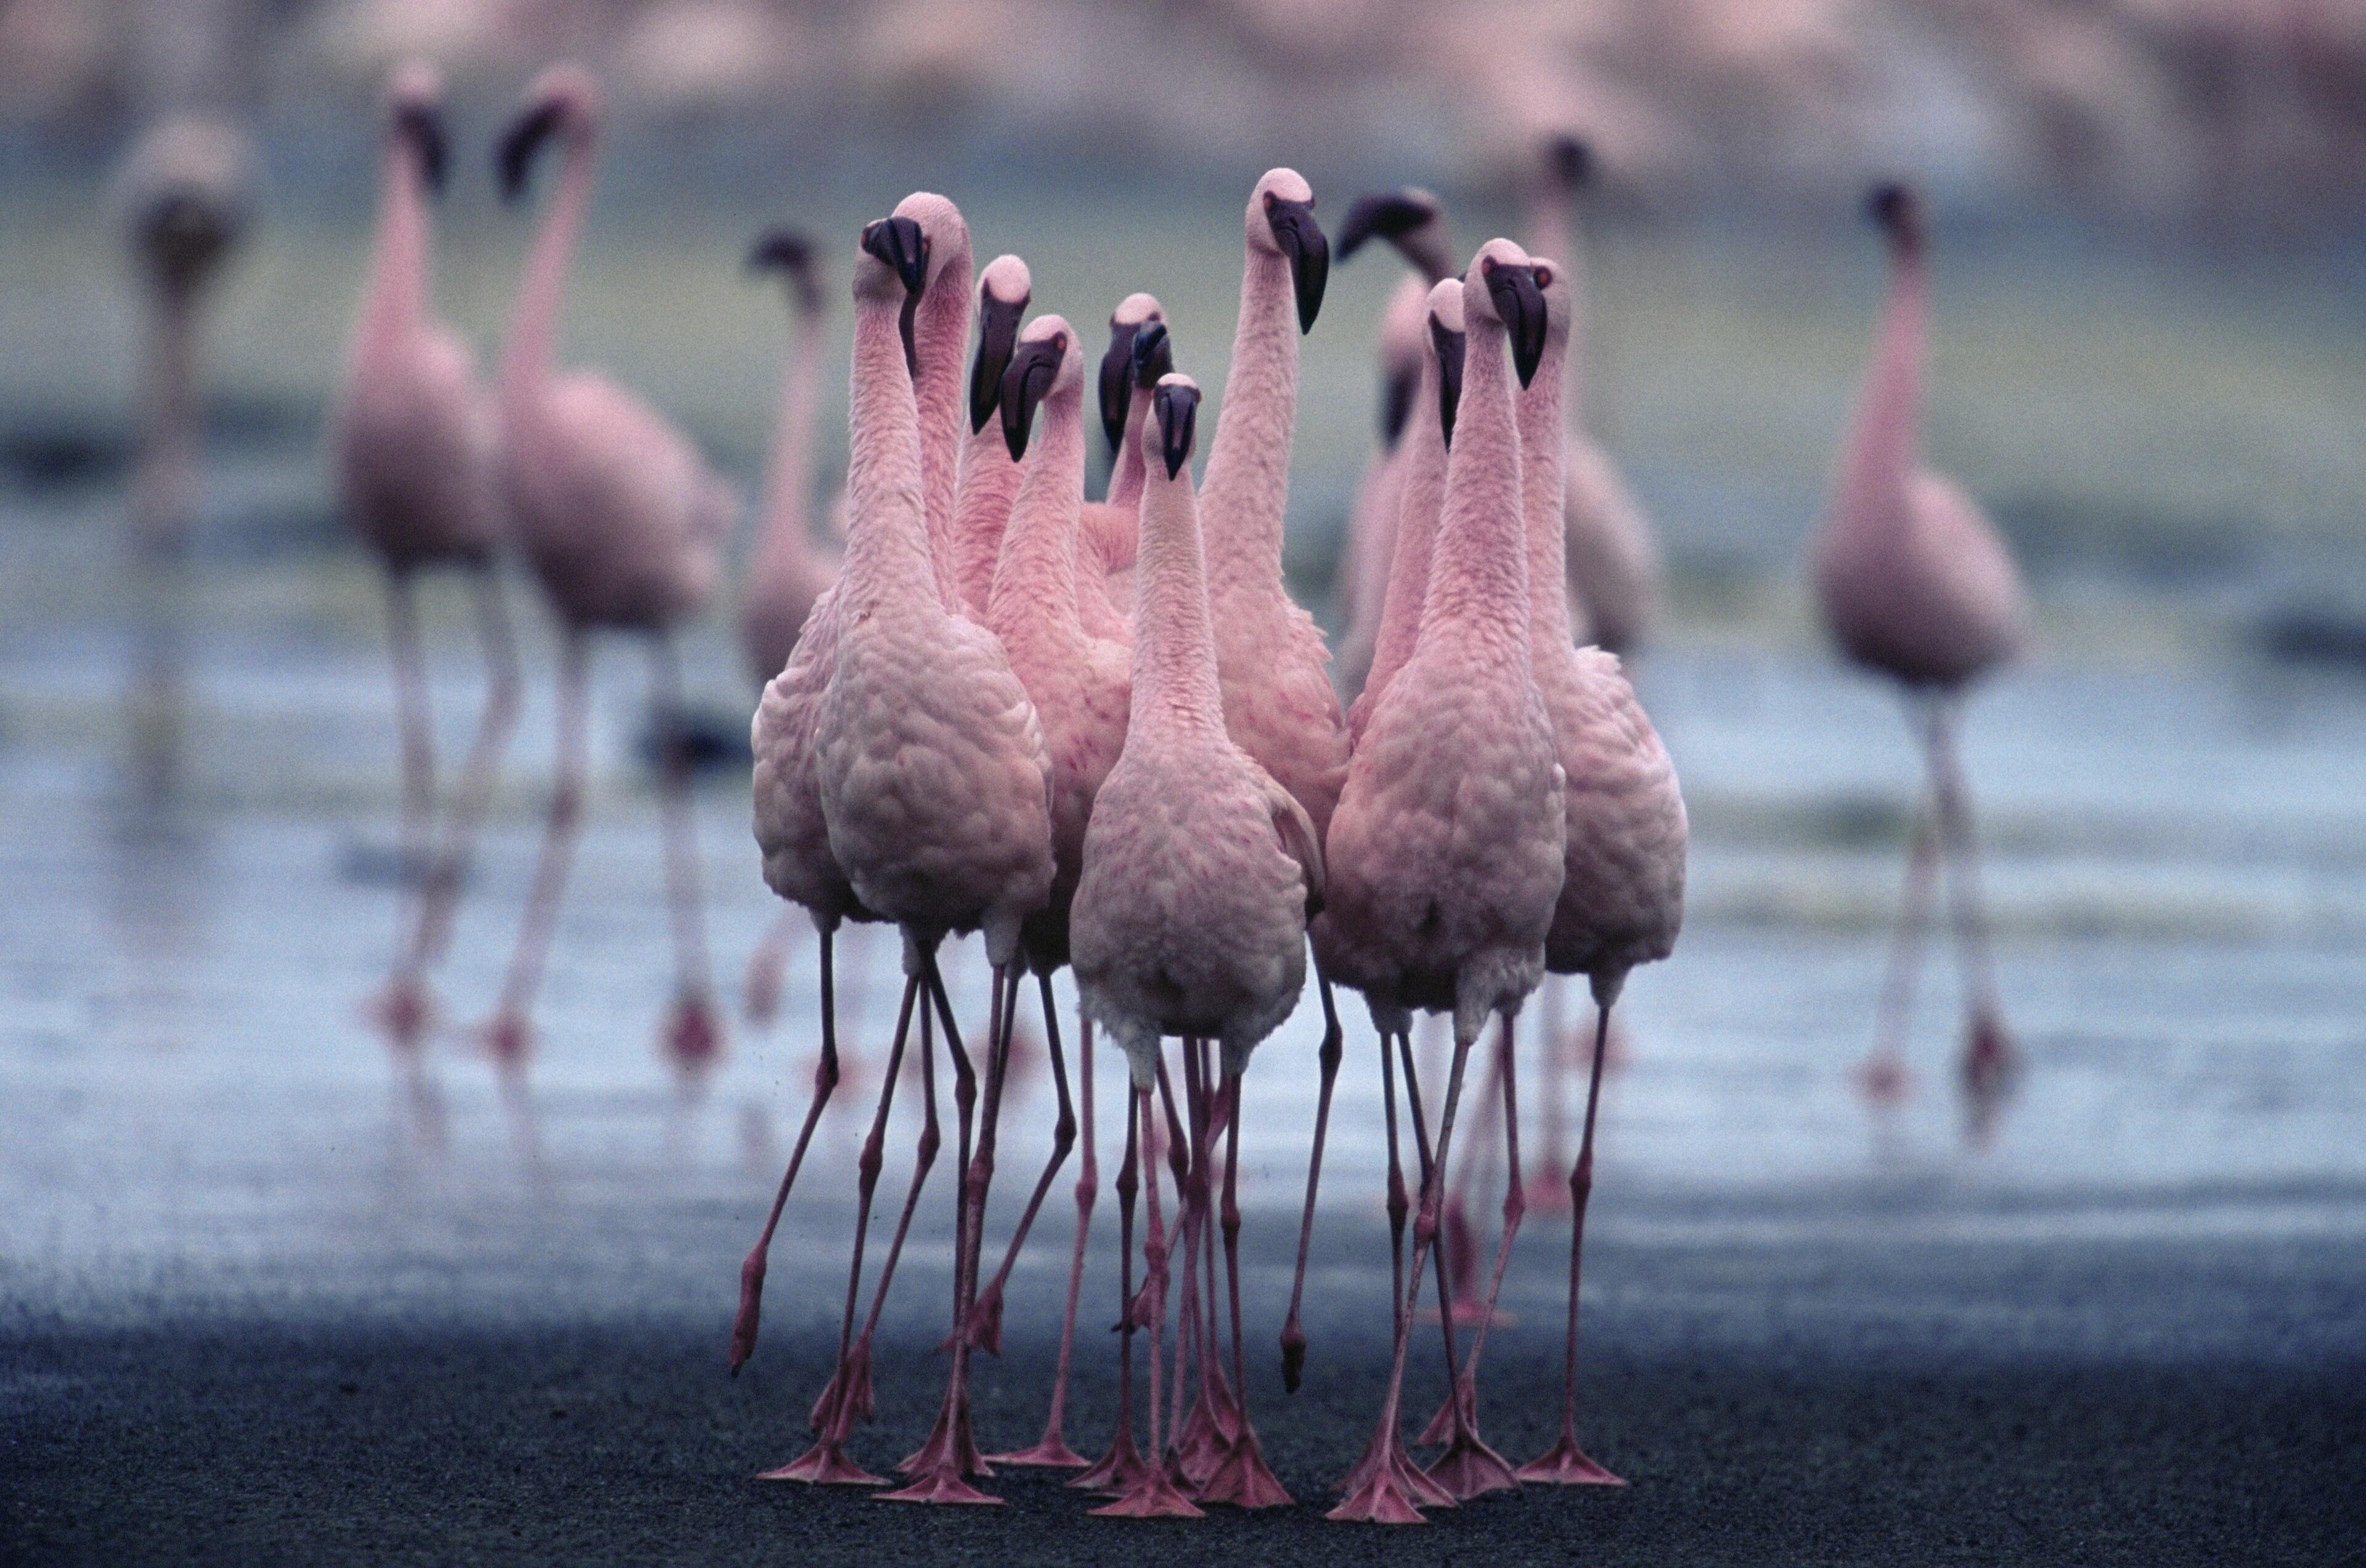 A close group of birds survey the scene.